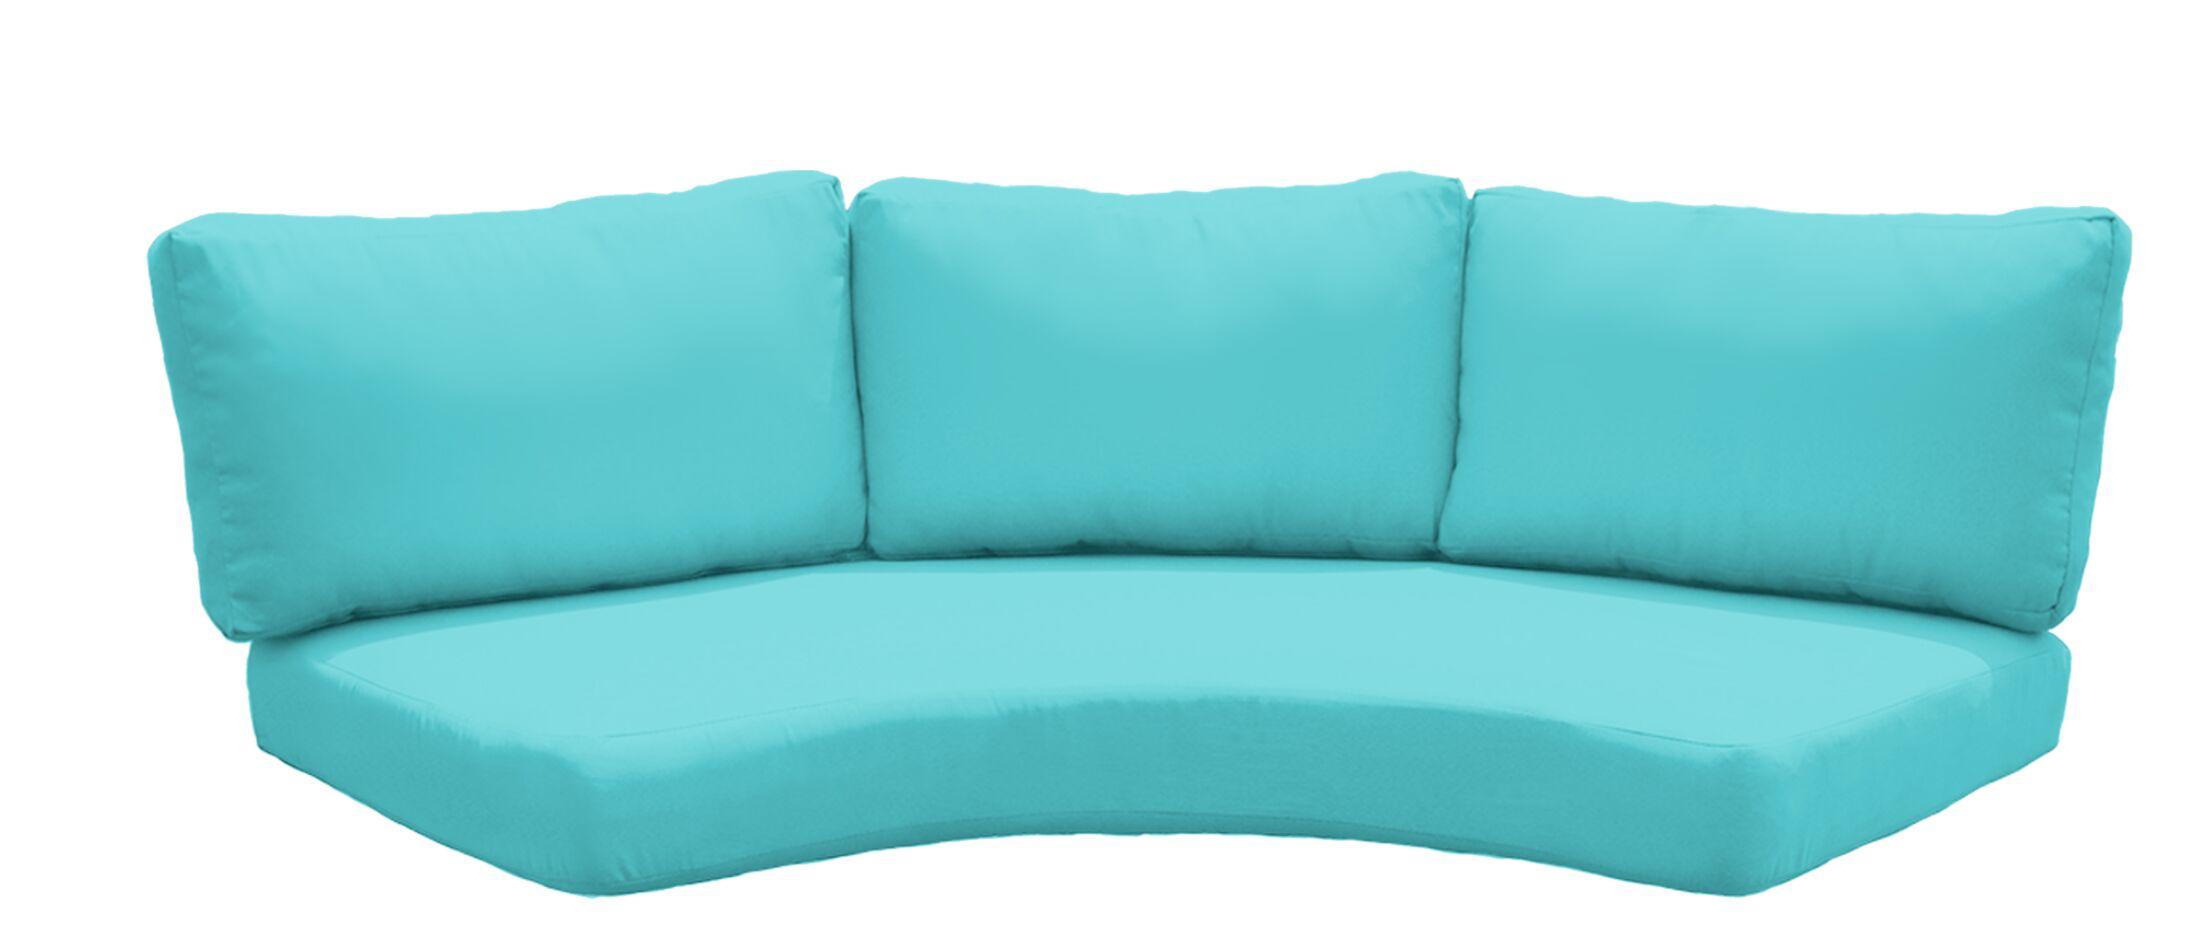 Fairmont Outdoor�Sofa Cushion Set Fabric: Aruba